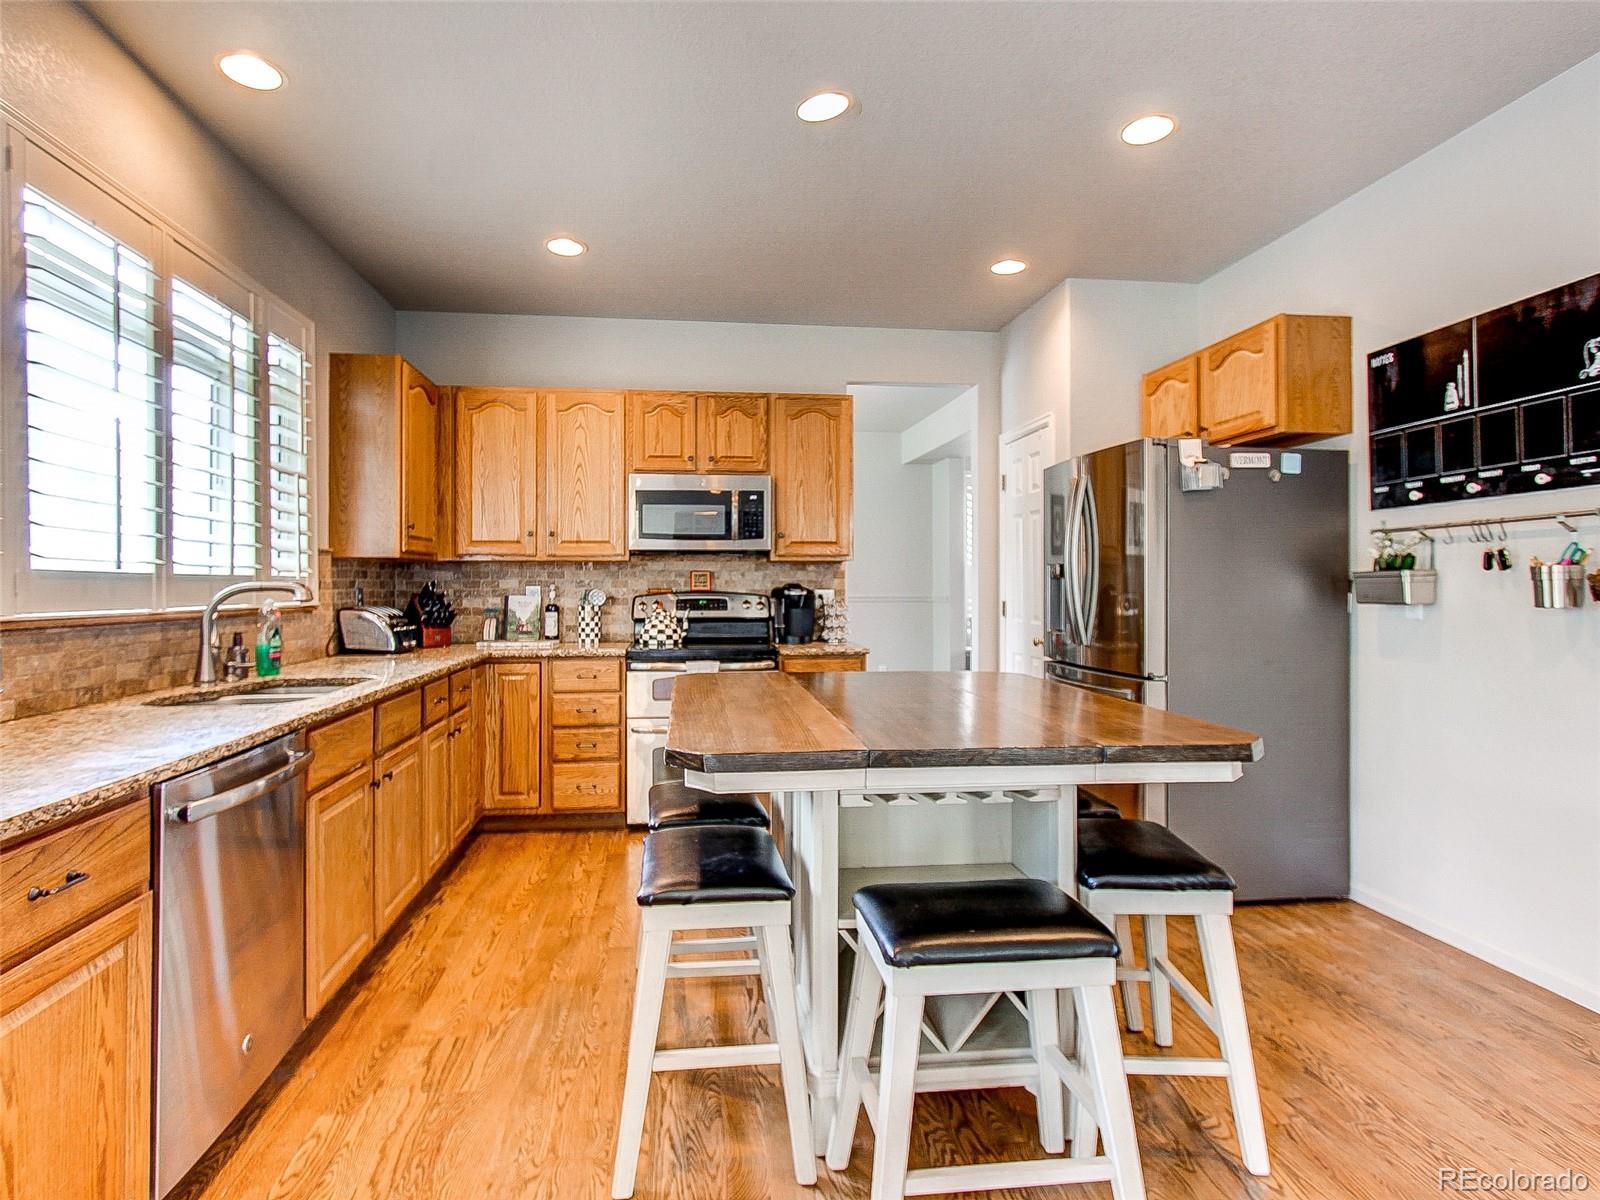 MLS# 8493612 - 9 - 3850 Mallard Street, Highlands Ranch, CO 80126